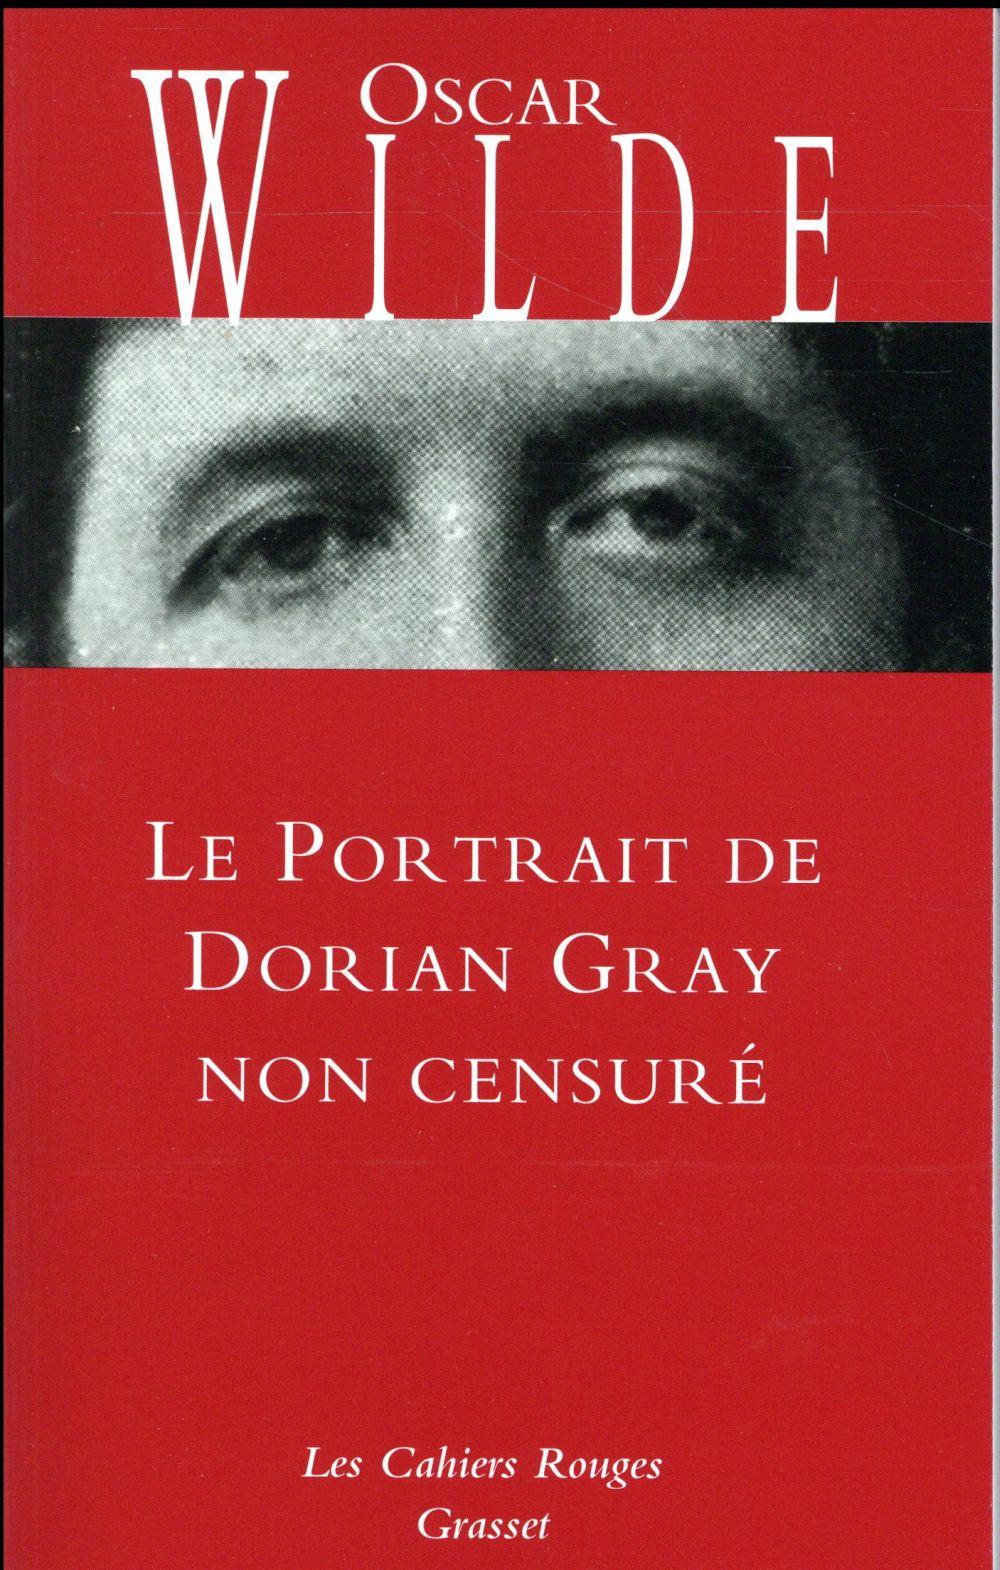 LE PORTRAIT DE DORIAN GRAY NON CENSURE Wilde Oscar Grasset